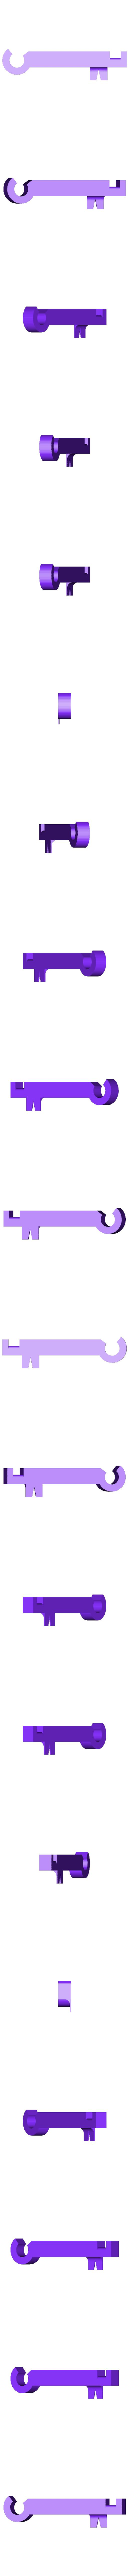 trigger_pull.stl Download free STL file Joystick PS4 • 3D print object, Osichan